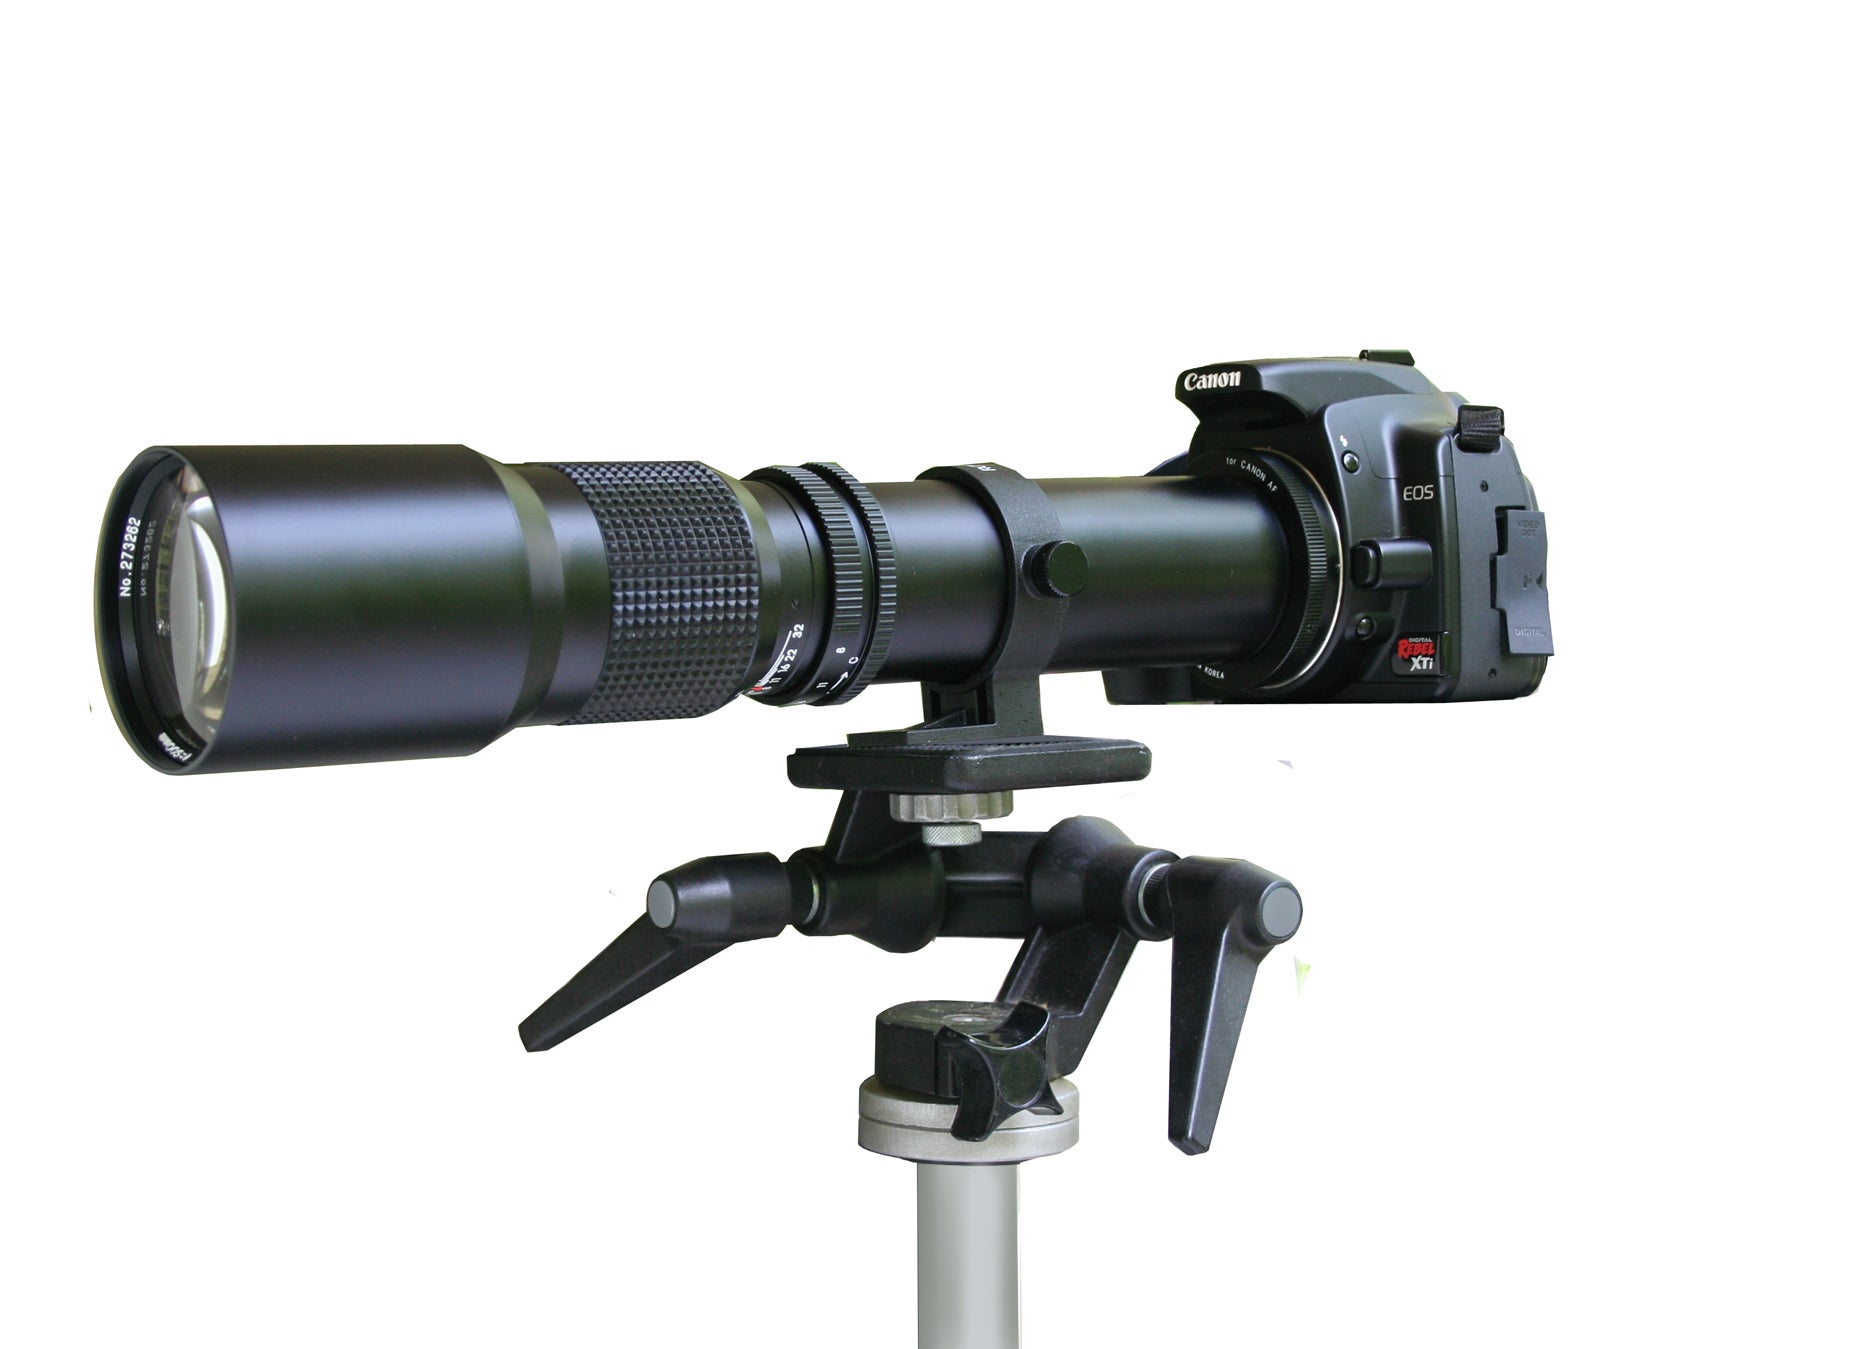 Rokinon 500mm telephoto mirror lens